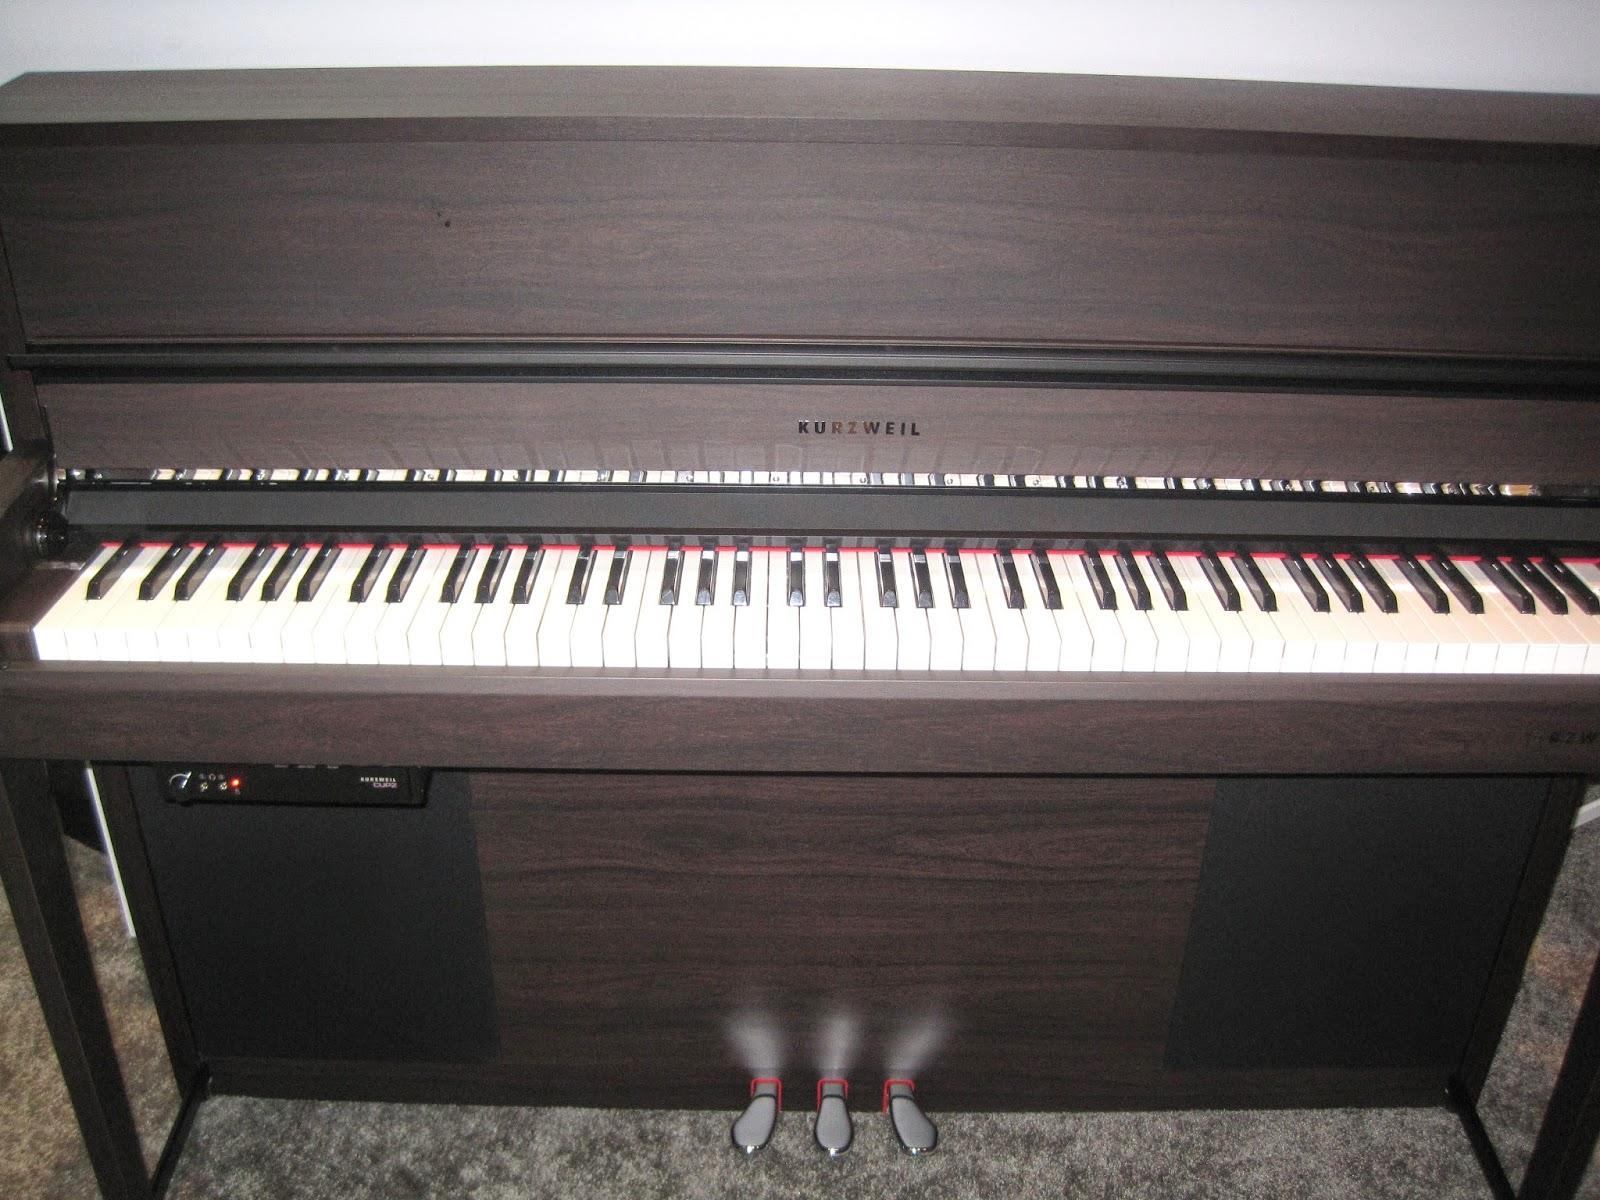 Kurzweil CUP2 digital piano rosewood